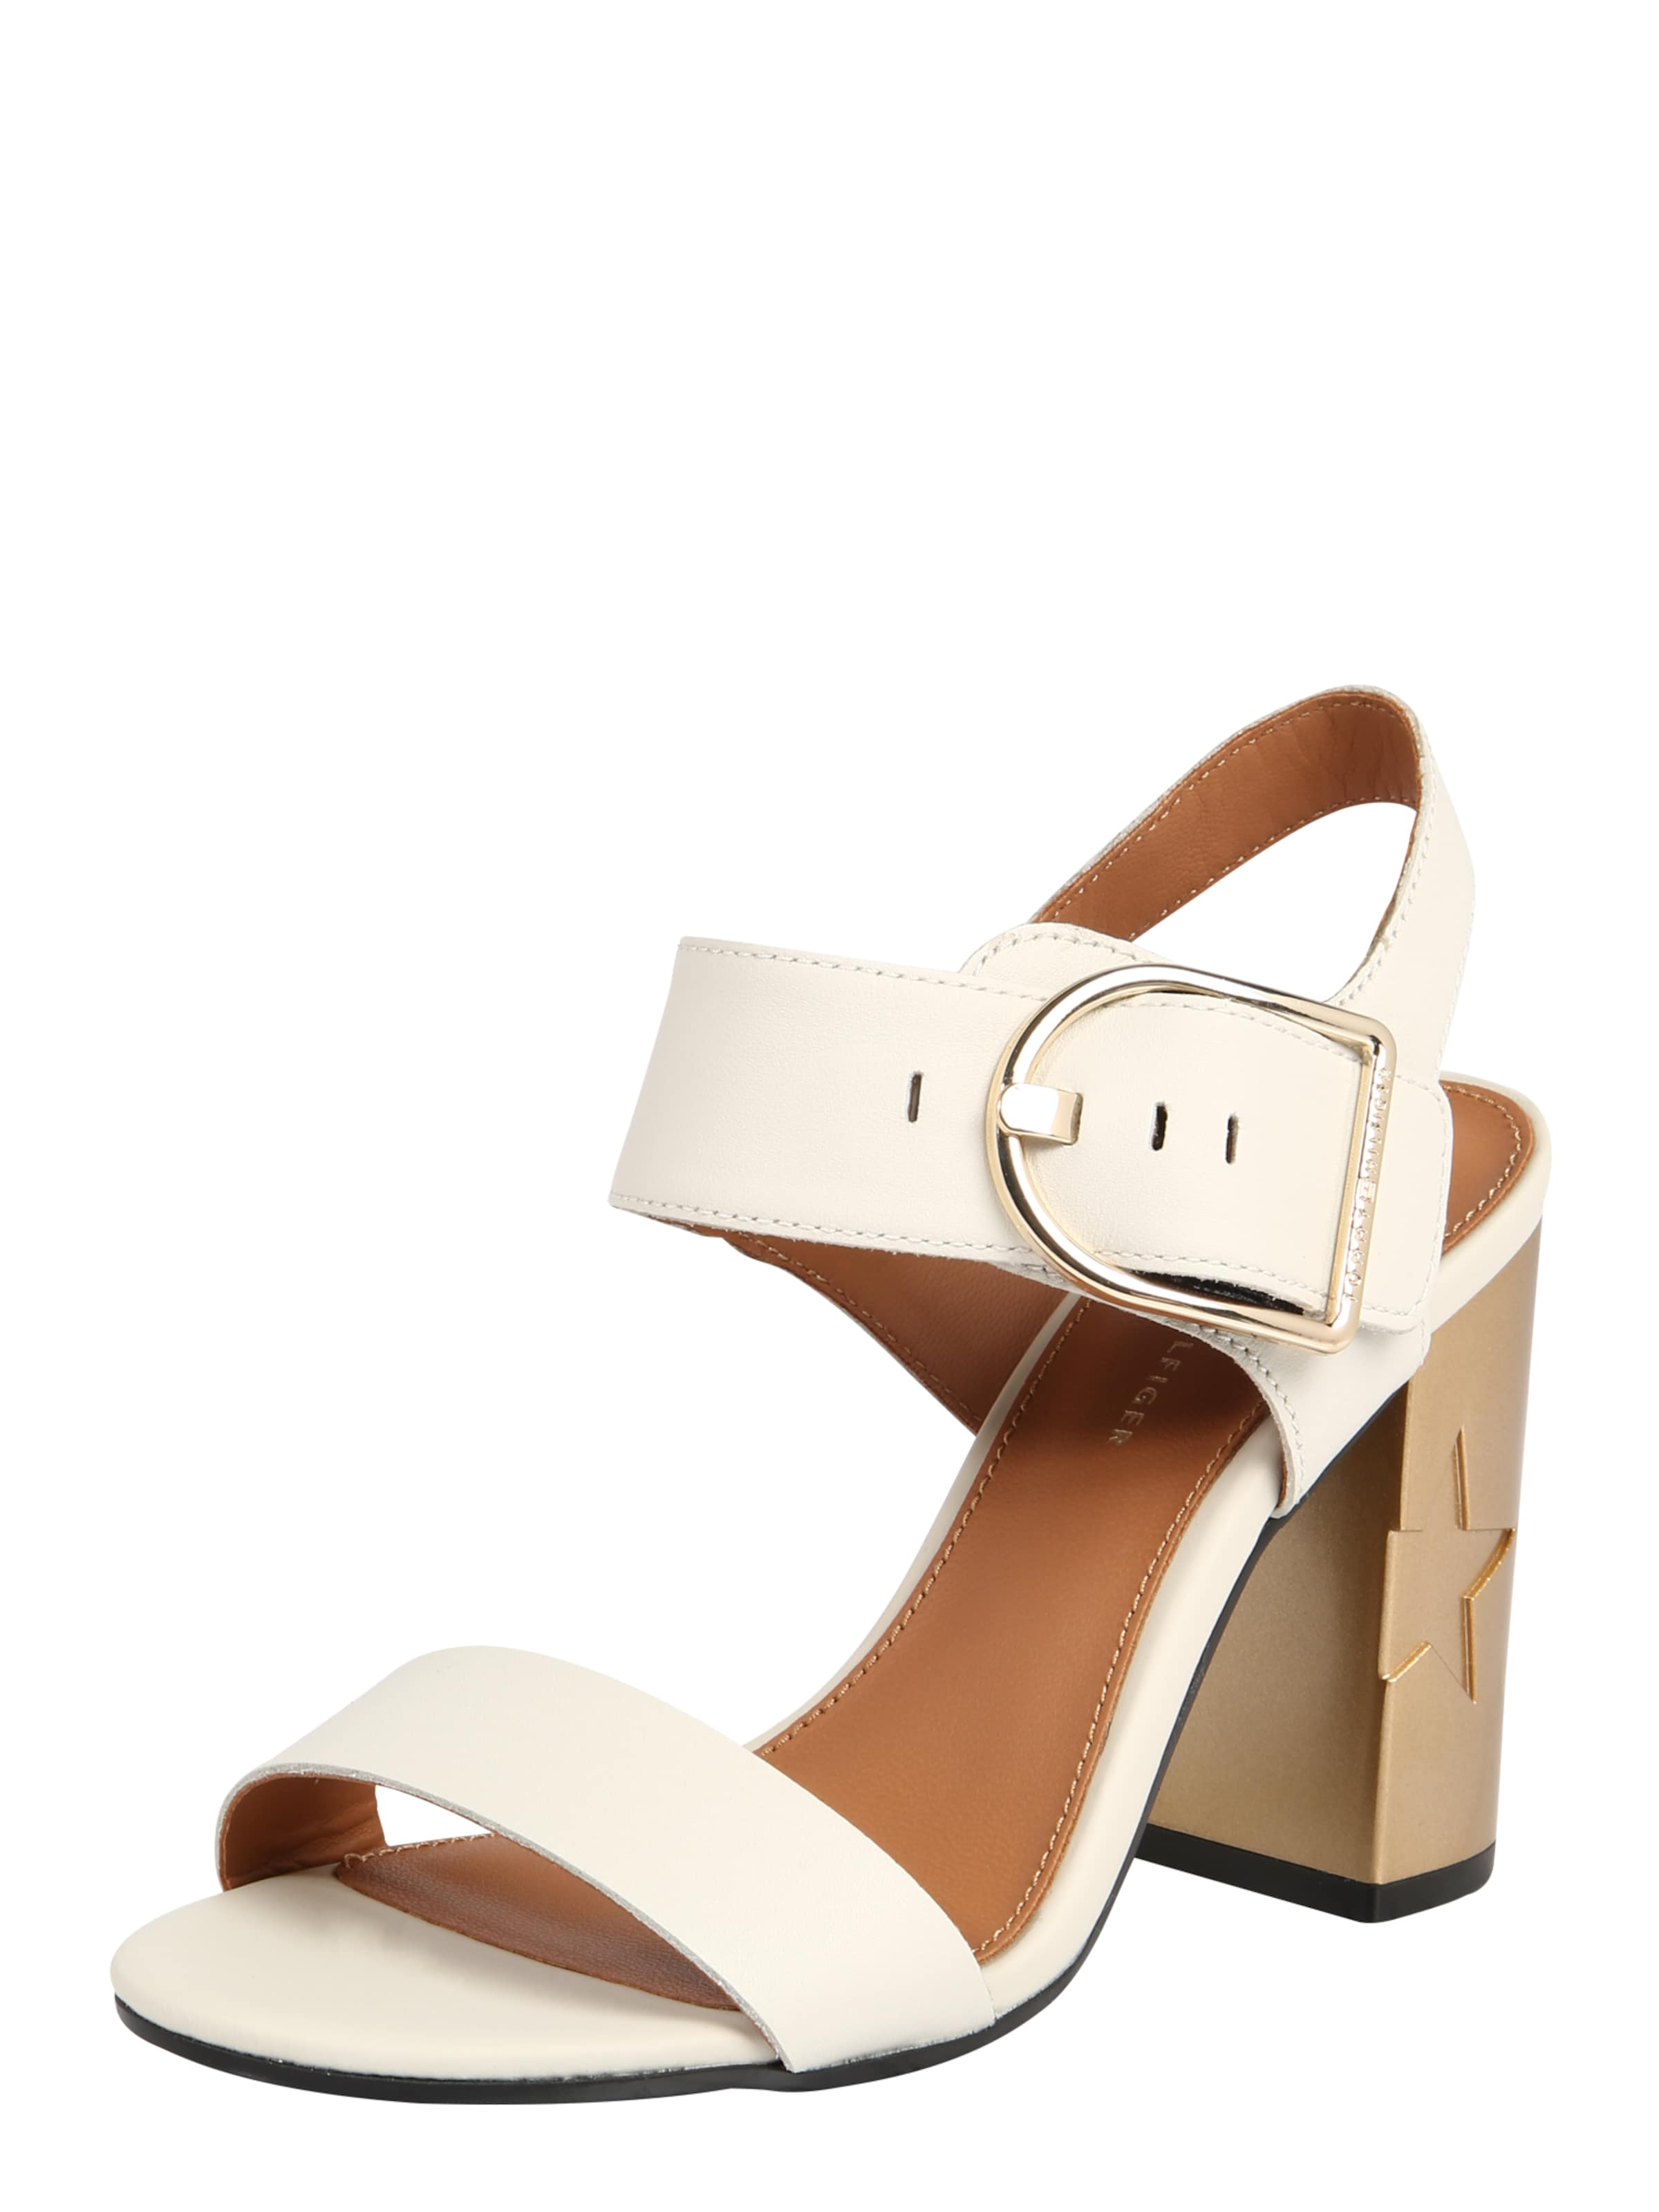 TOMMY HILFIGER Sandalette Günstige und langlebige Schuhe